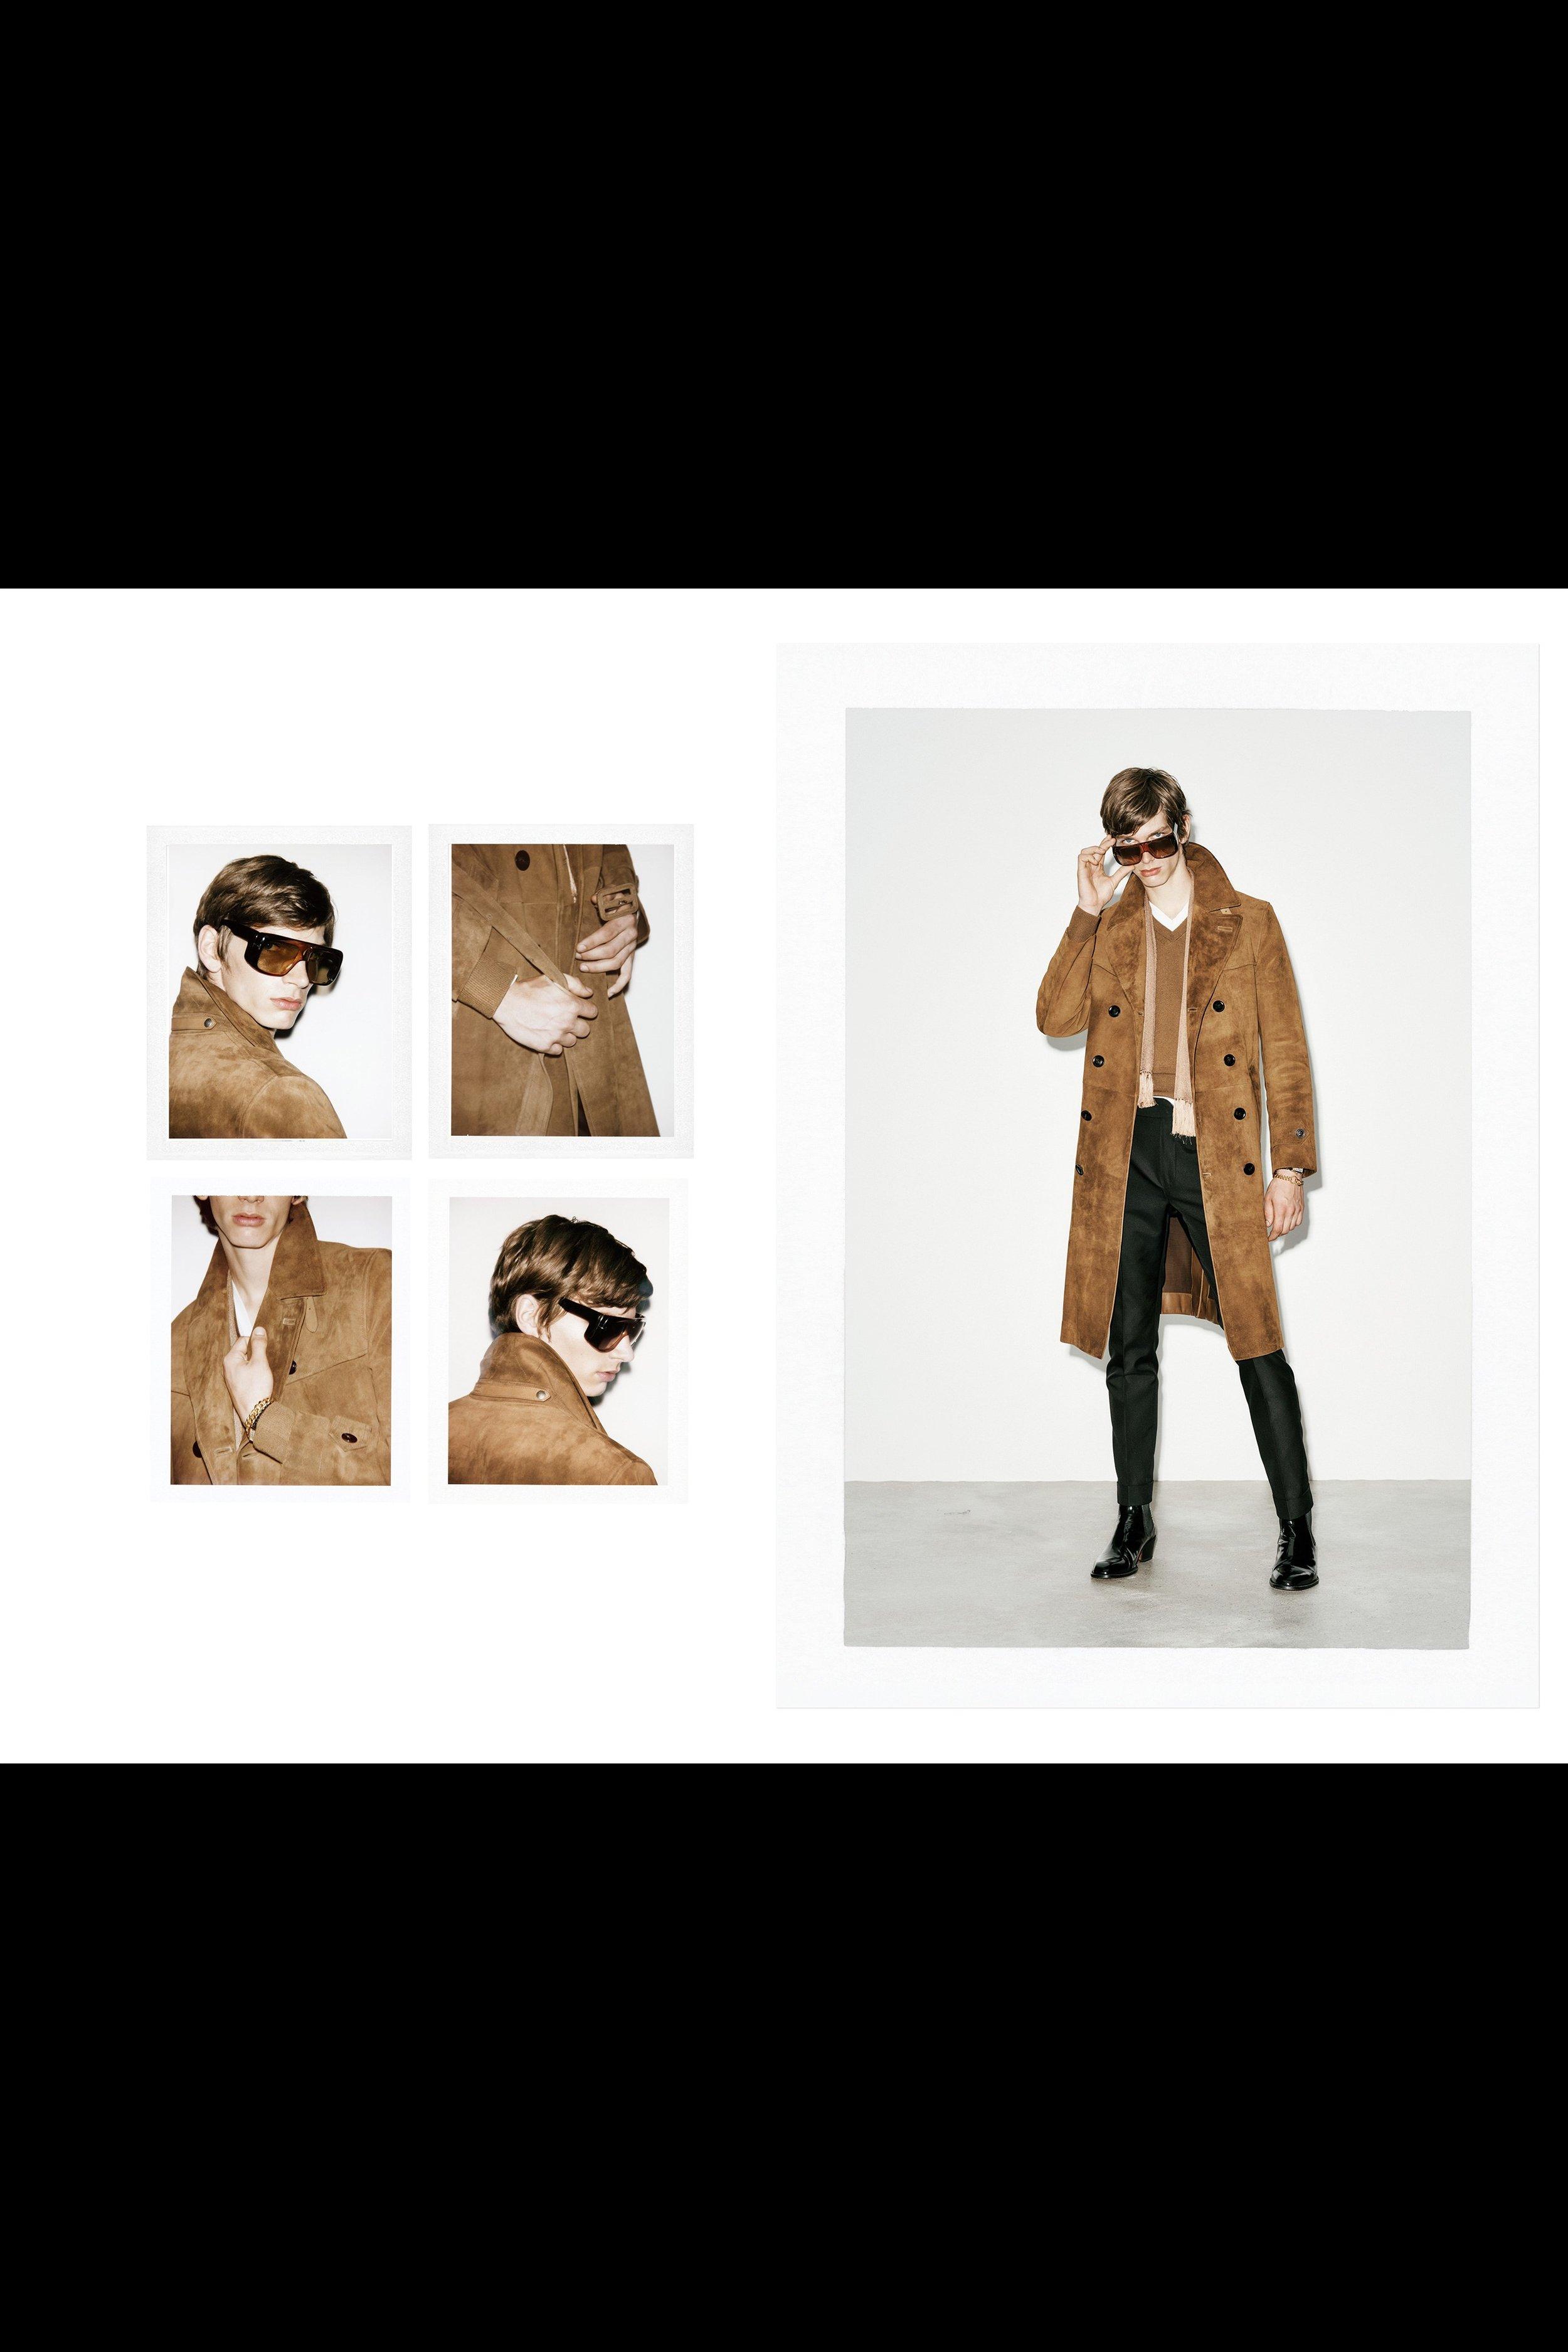 00029-Tom-Ford-vogue-menswear-spring-2019-pr.jpg